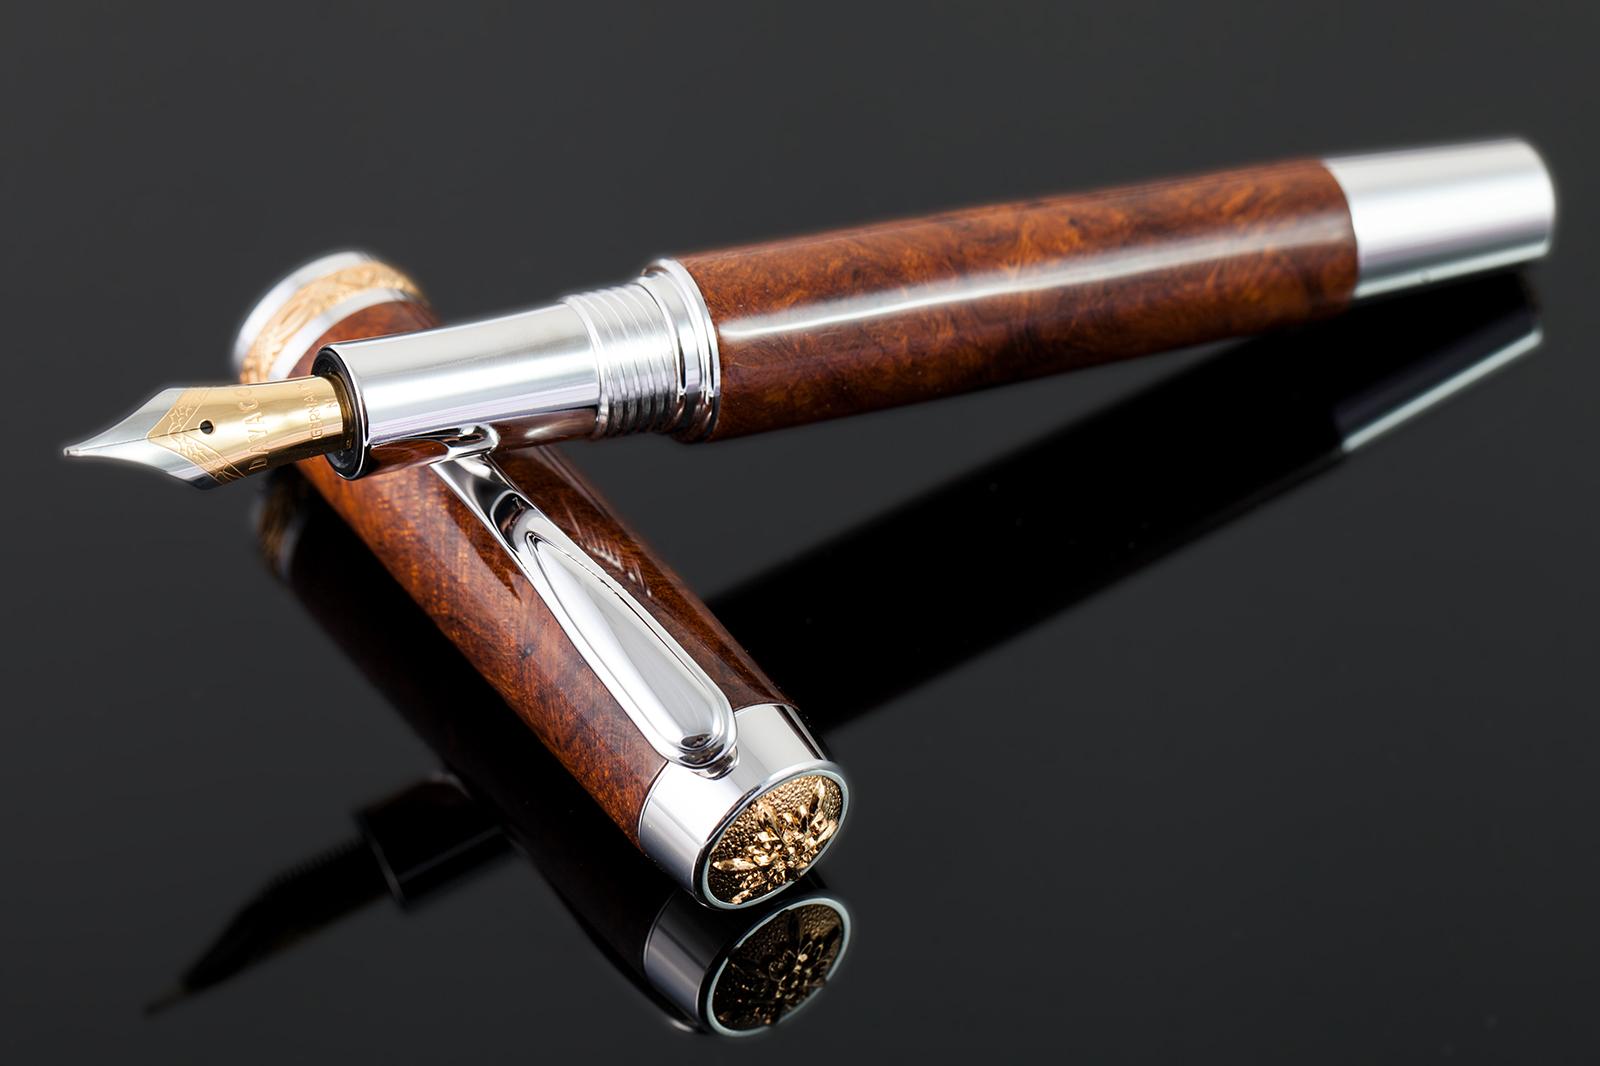 0-Füller-Wüsteneisenholz-Statesman-Feder-02